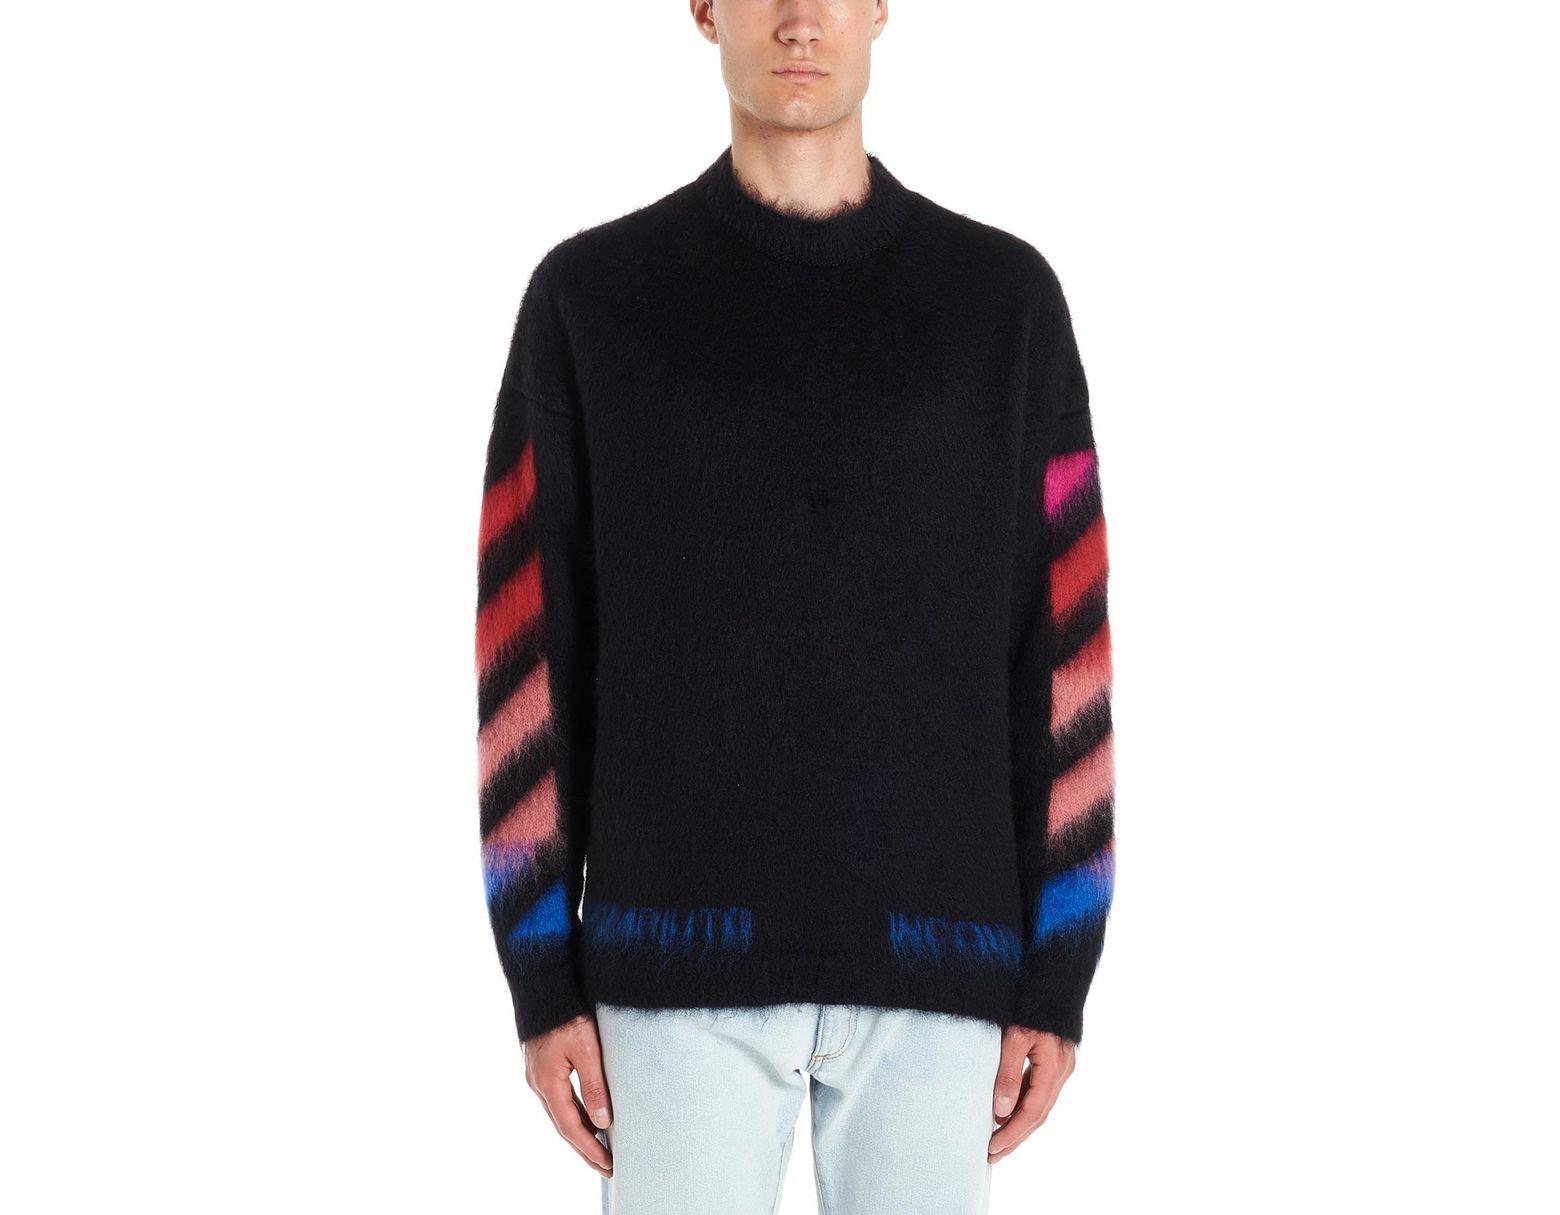 5455faf85b3b9c Off-White c/o Virgil Abloh 'diagonal Brushed Mohair' Sweater in Black for  Men - Lyst